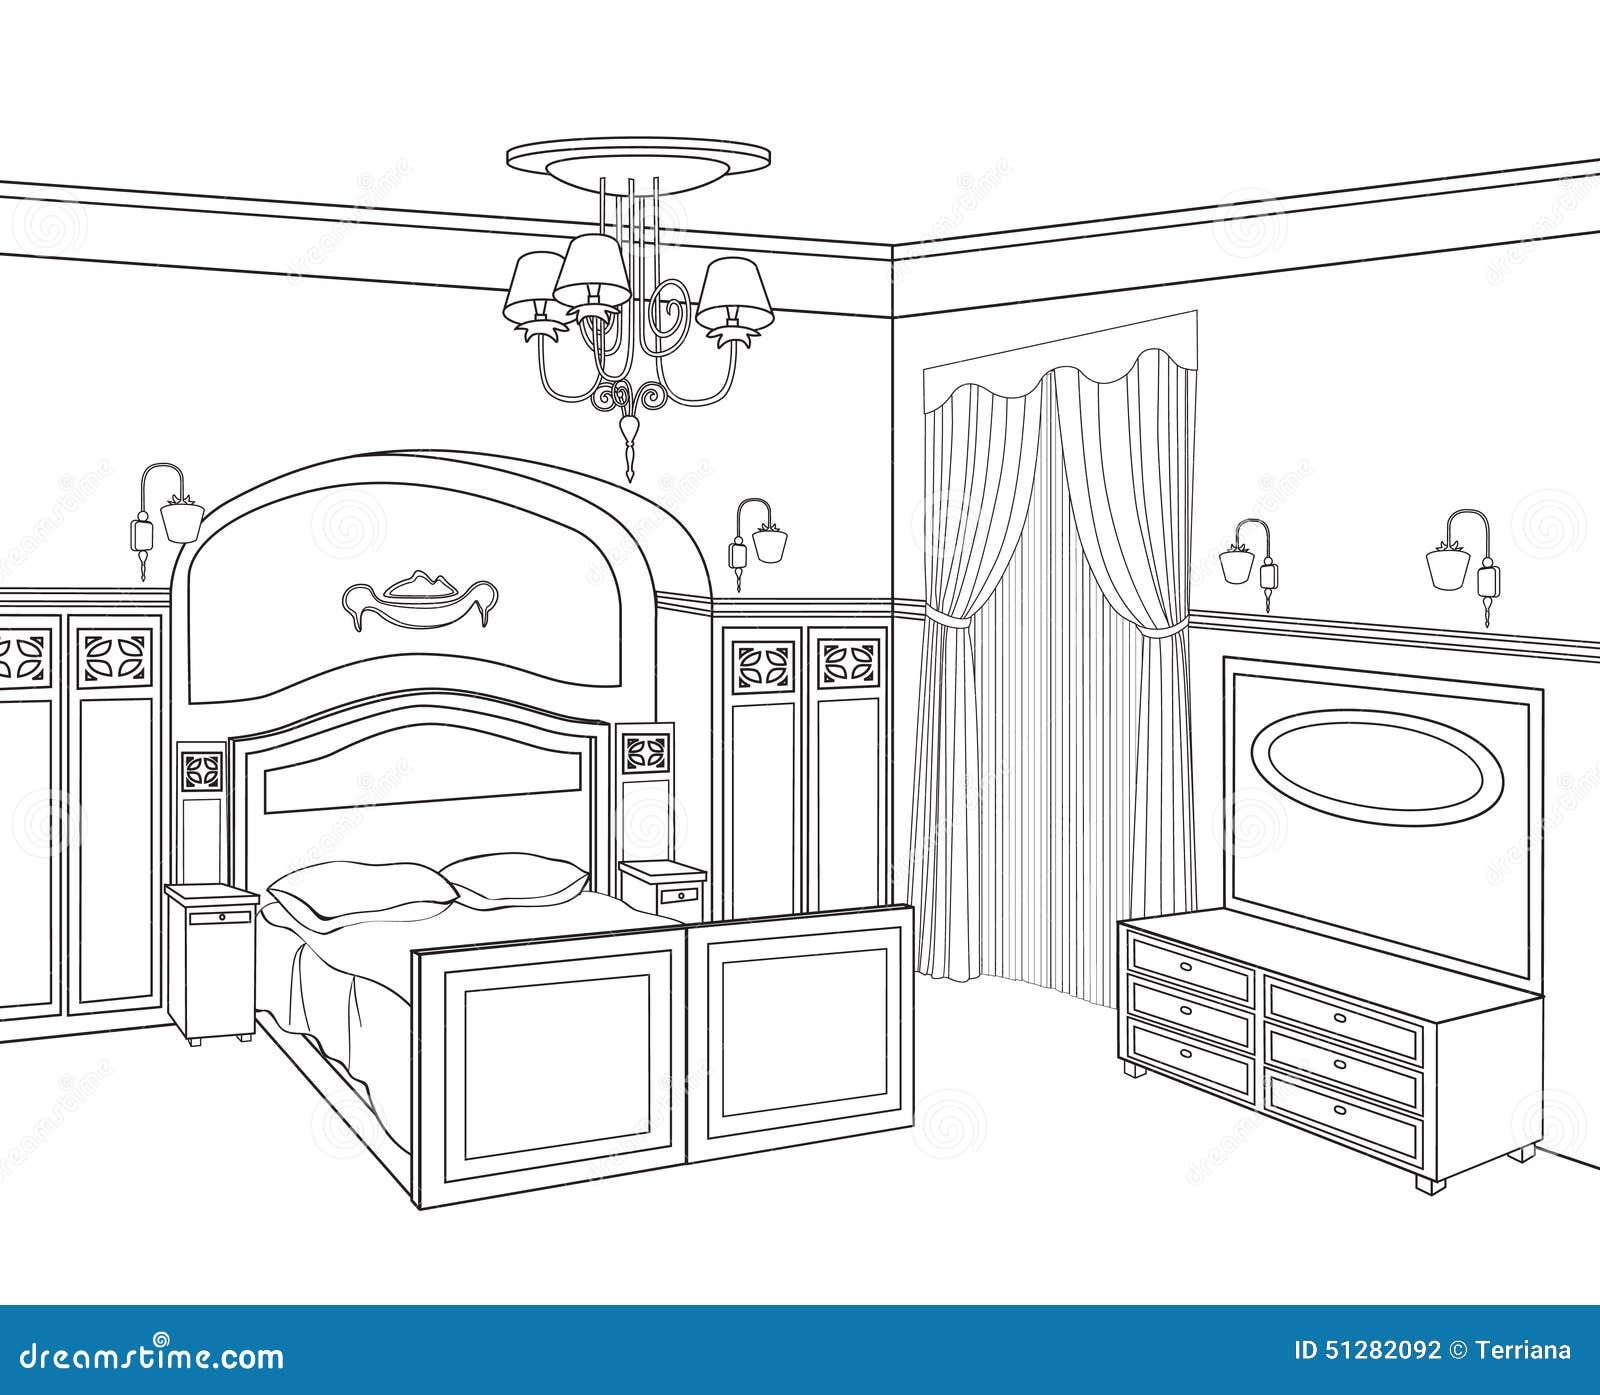 20170131054123 vintage schlafzimmermöbel ~ easinext.com - Faszinierende Vintage Schlafzimmermobel Romantisch Und Sus